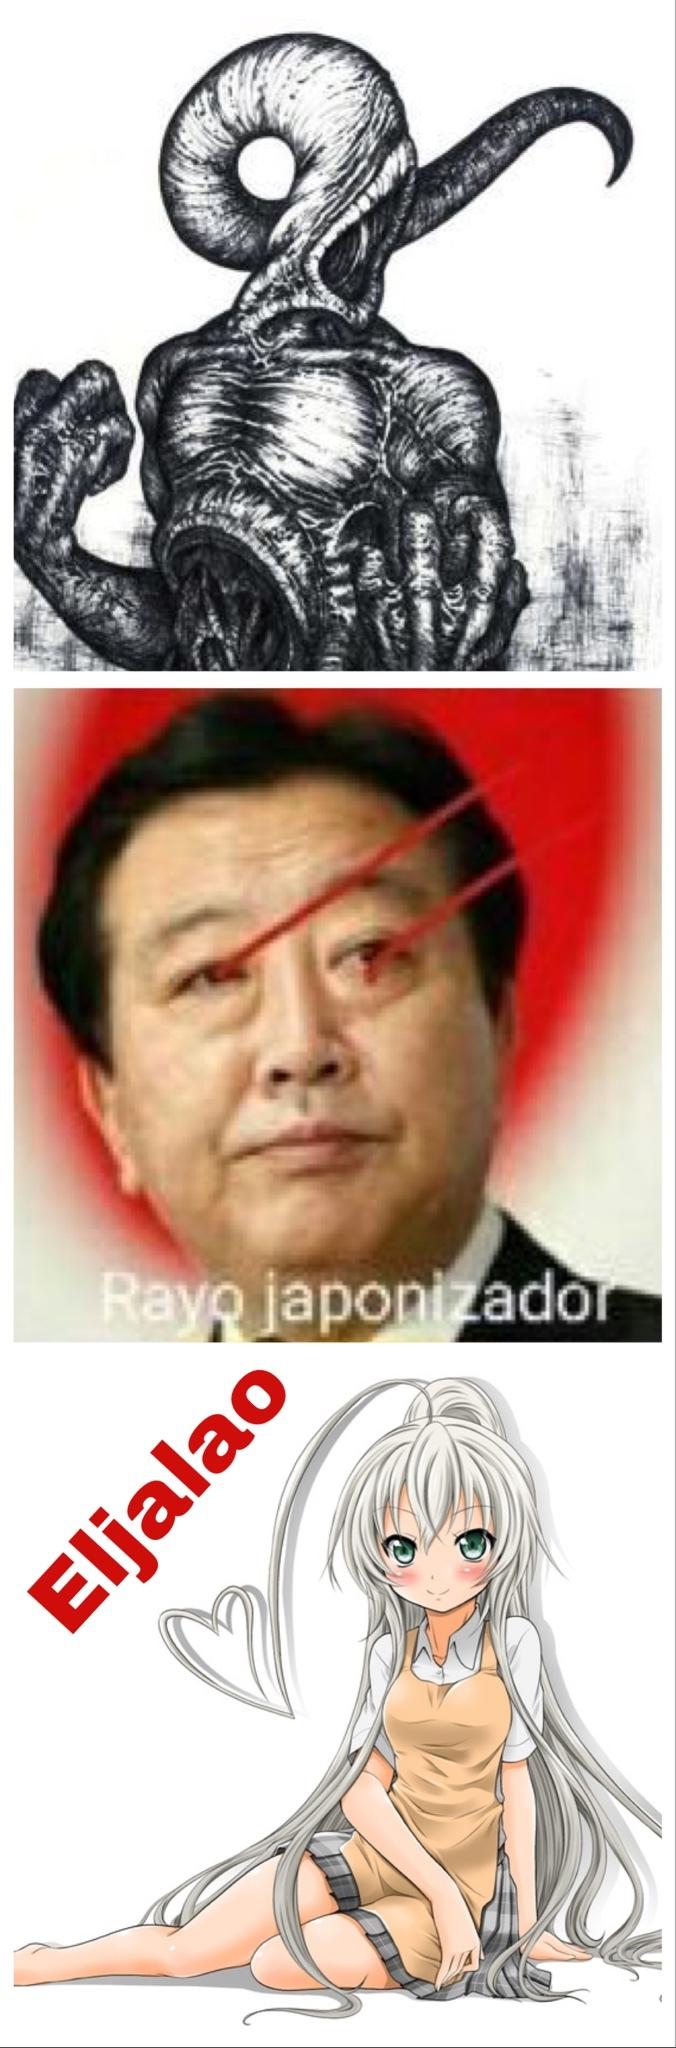 Esos Japos........(el anime es Haiyore! Nyaruko san) - meme